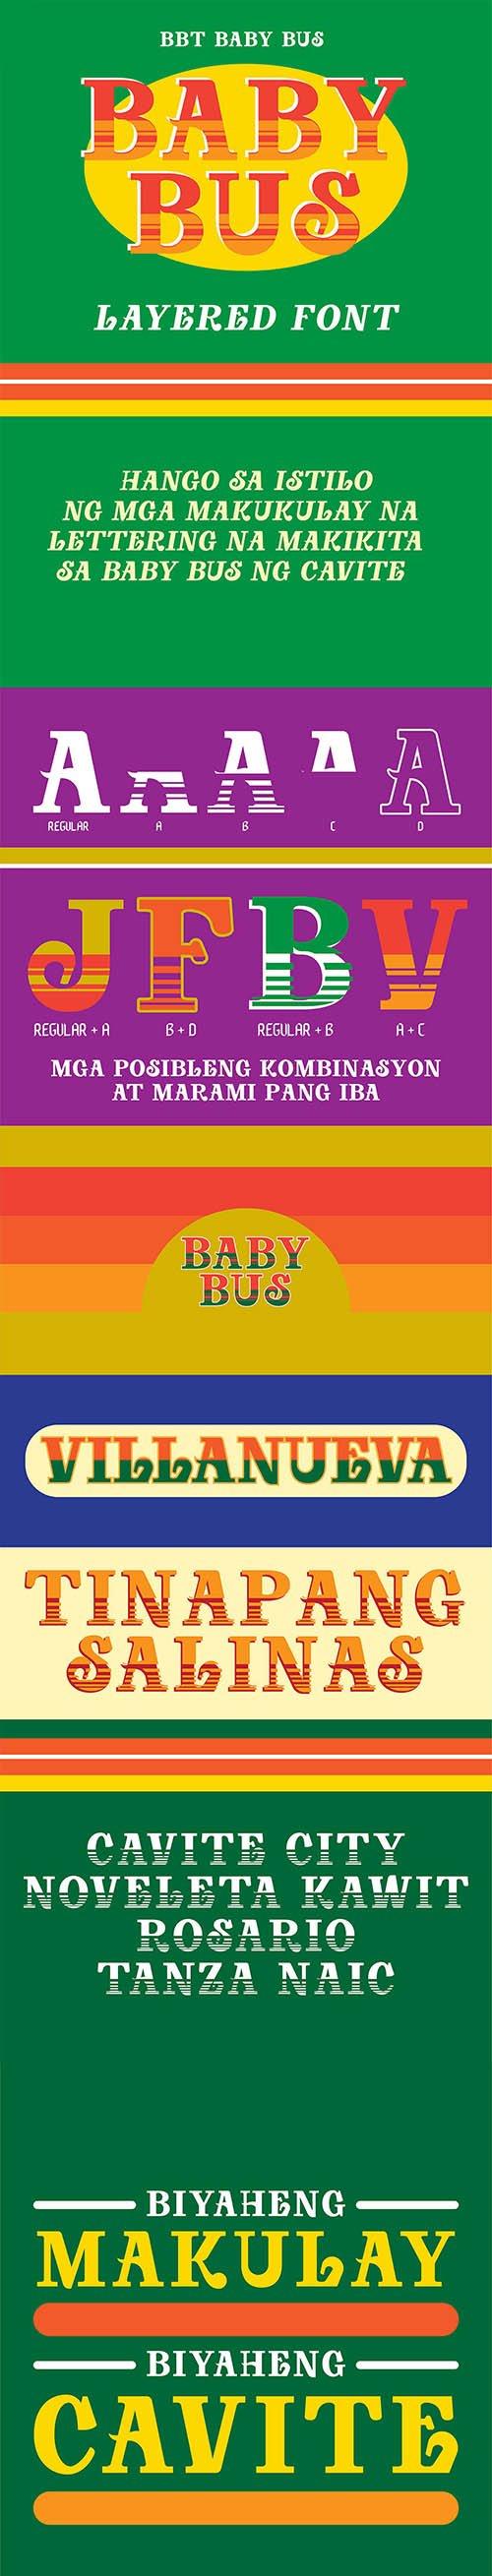 Baby Bus Slab Serif Script Font Family